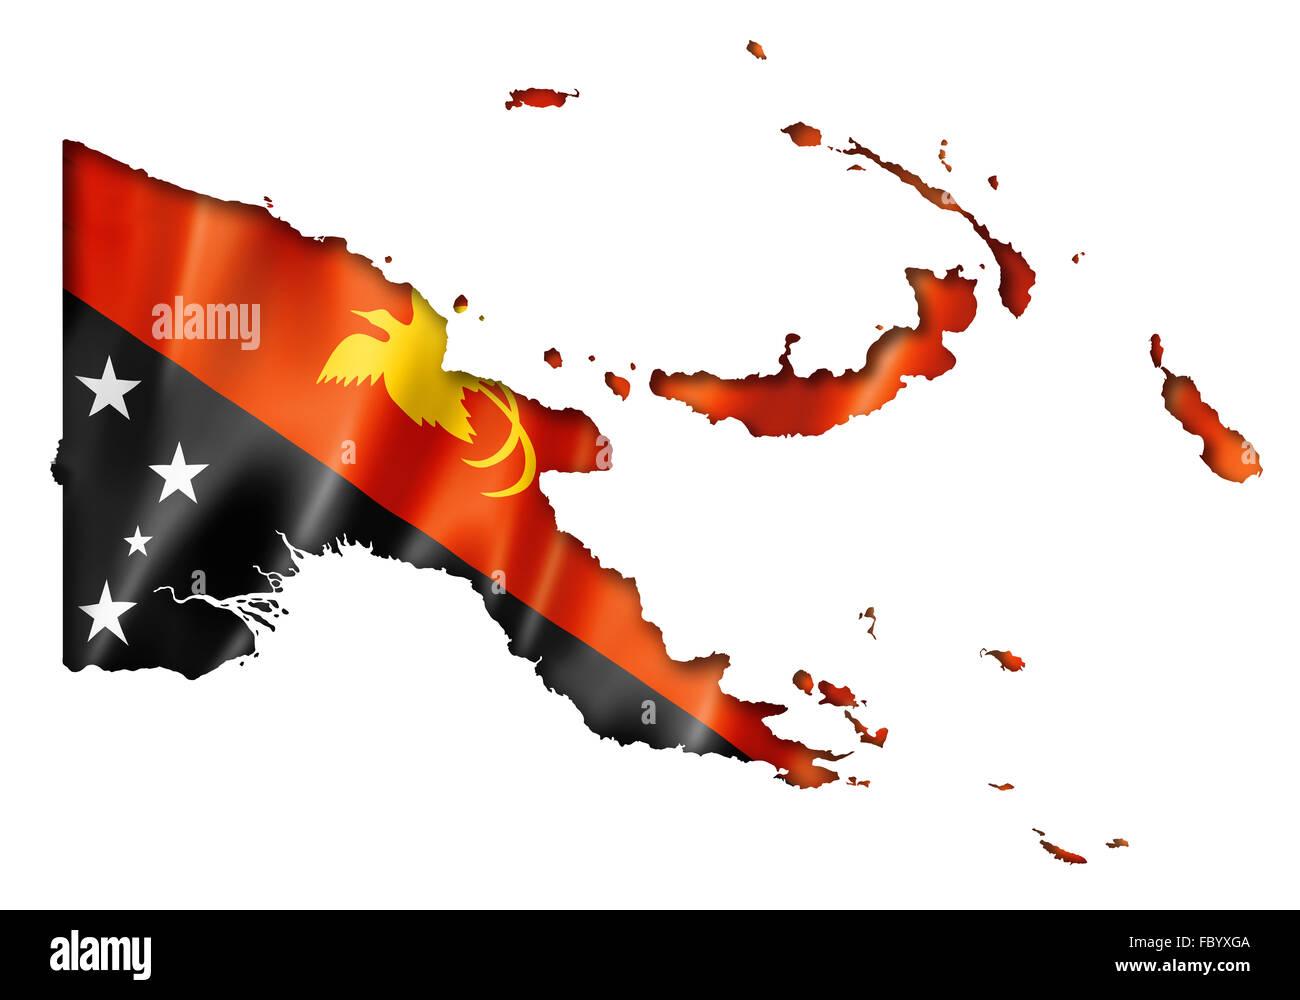 Papua New Guinea flag map Stock Photo: 93426602 - Alamy